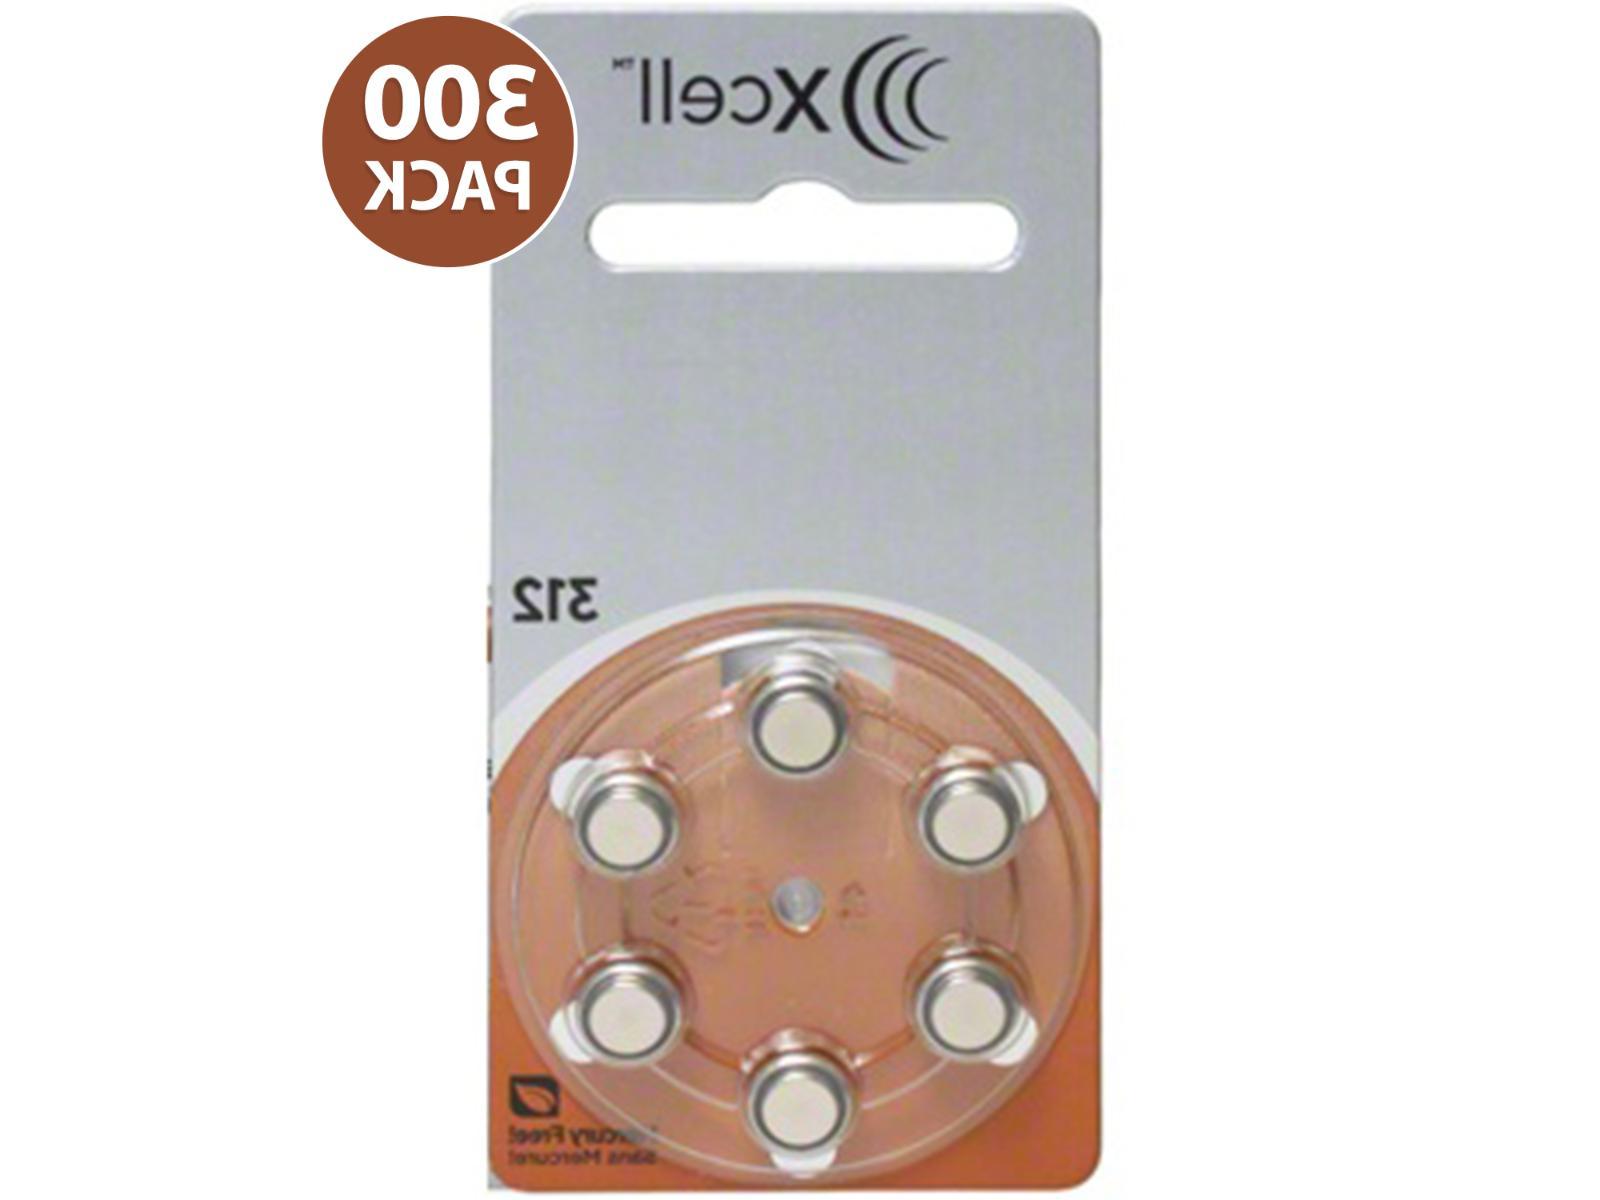 xcell size 312 zinc air mf hearing